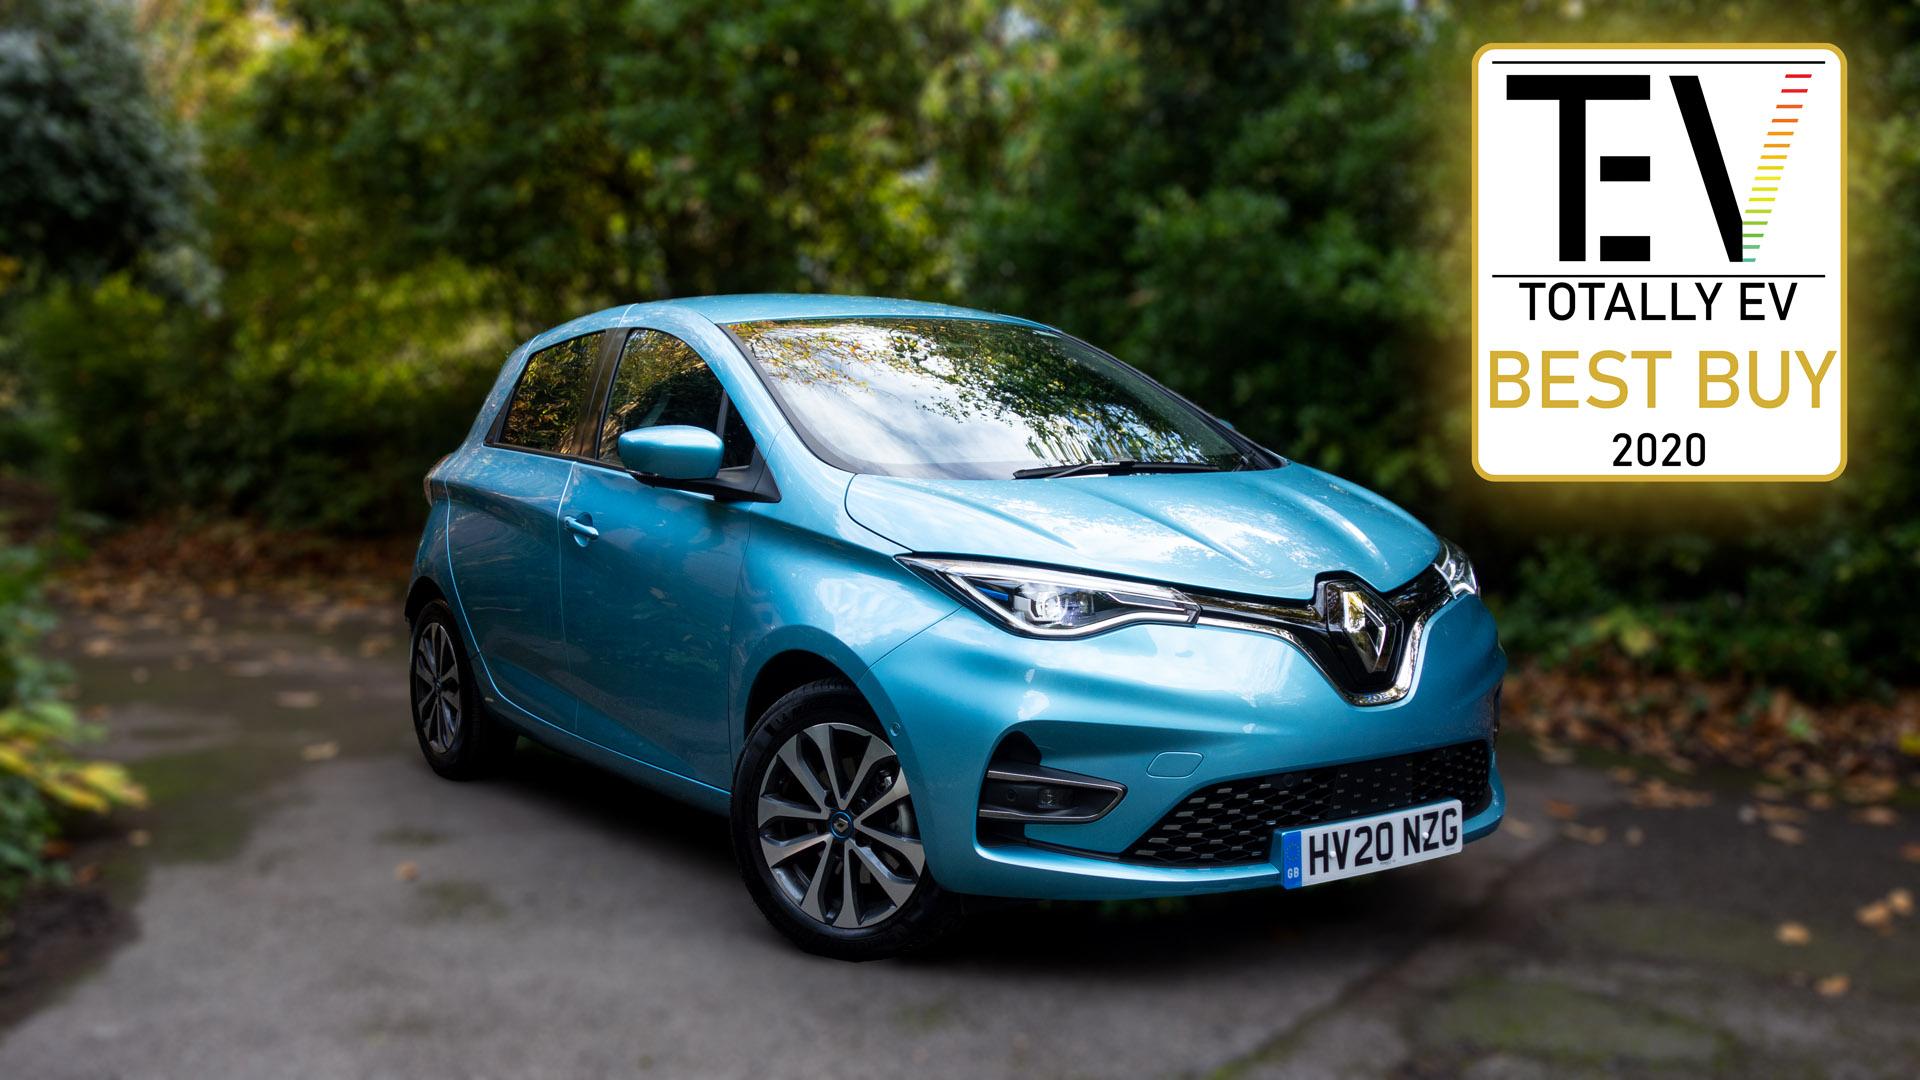 Renault Zoe TotallyEV